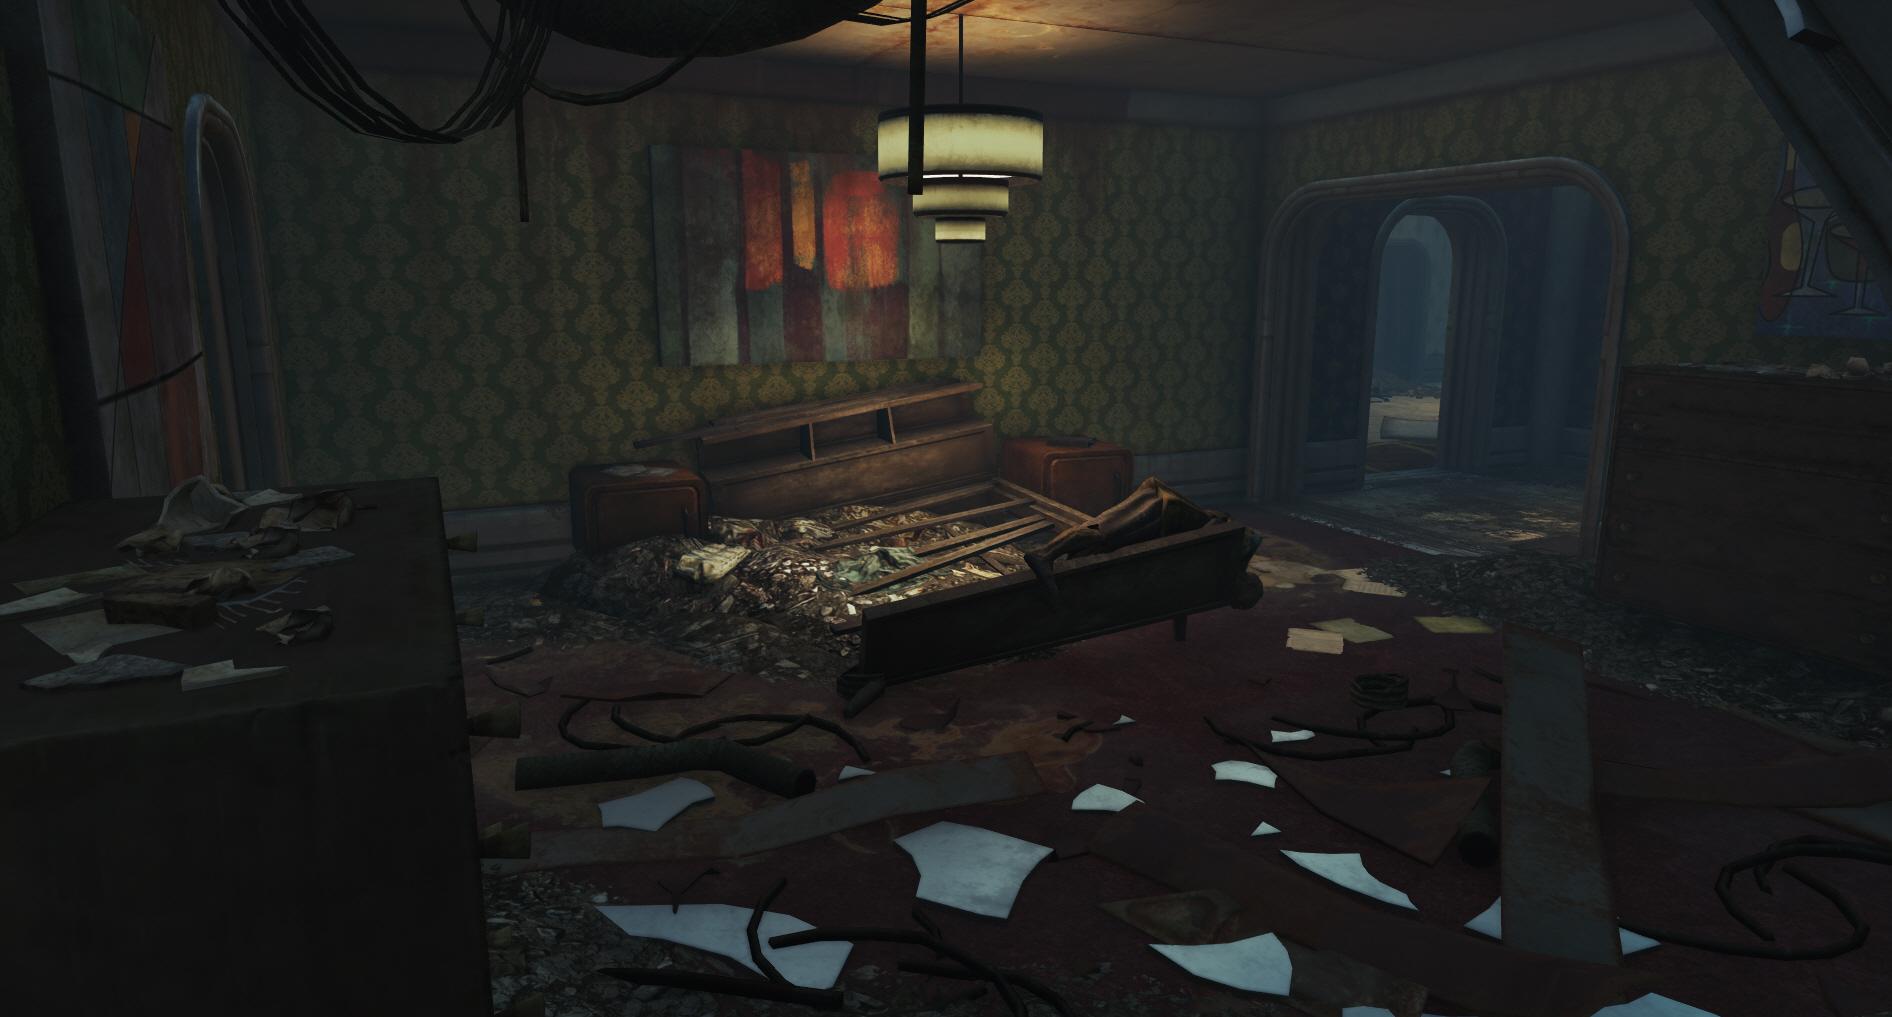 CliffsEdge-Room2-FarHarbor